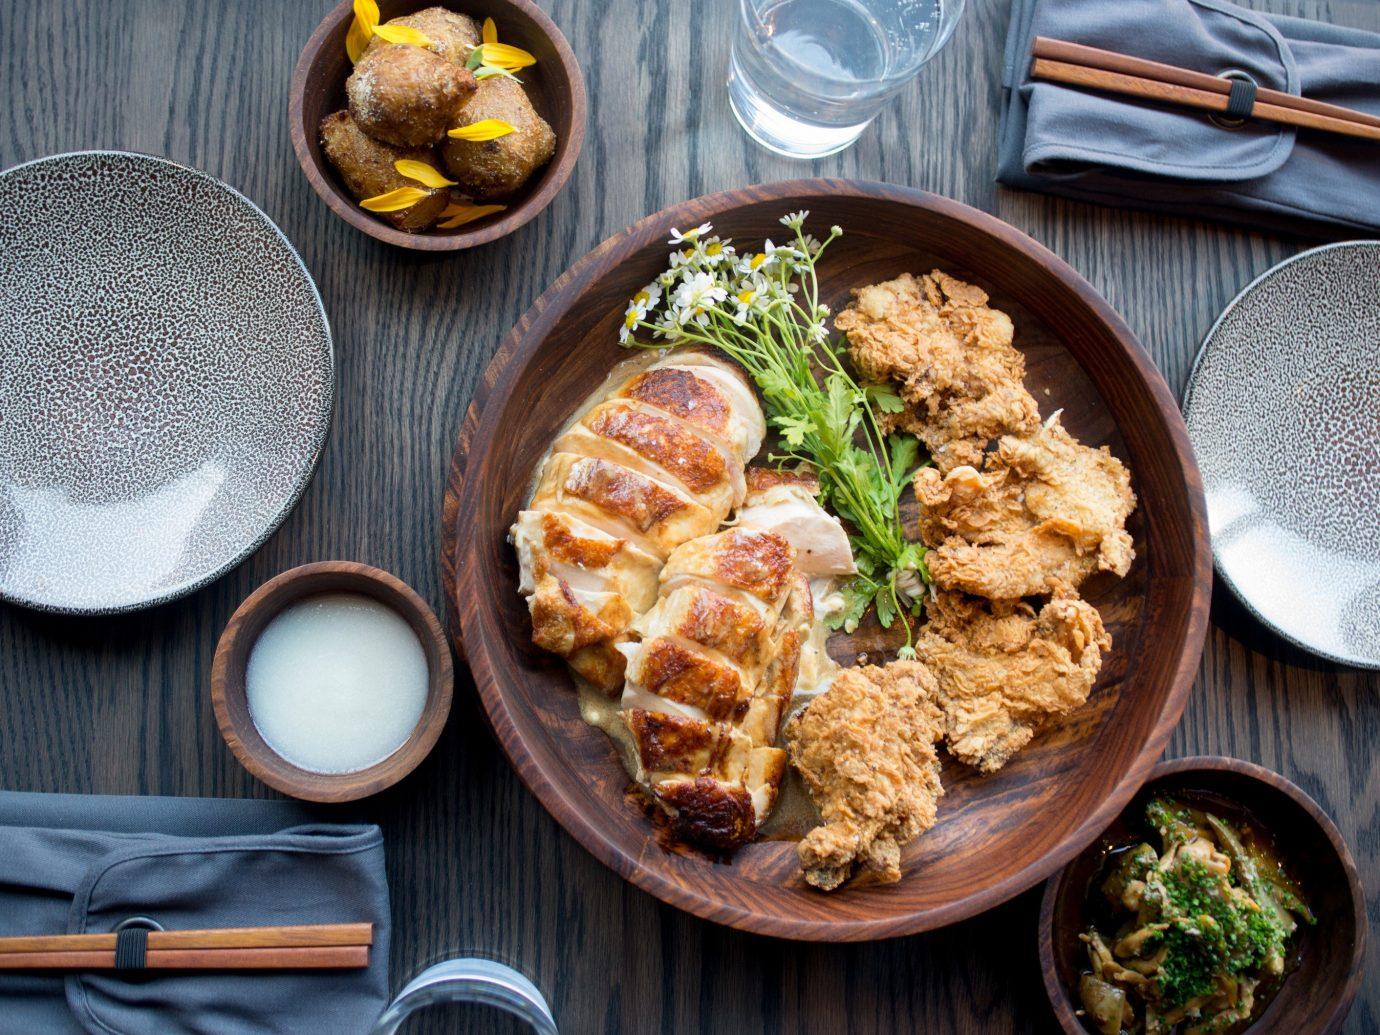 Summer Series table food plate dish wooden meal cuisine breakfast lunch produce asian food meat vegetarian food vegetable